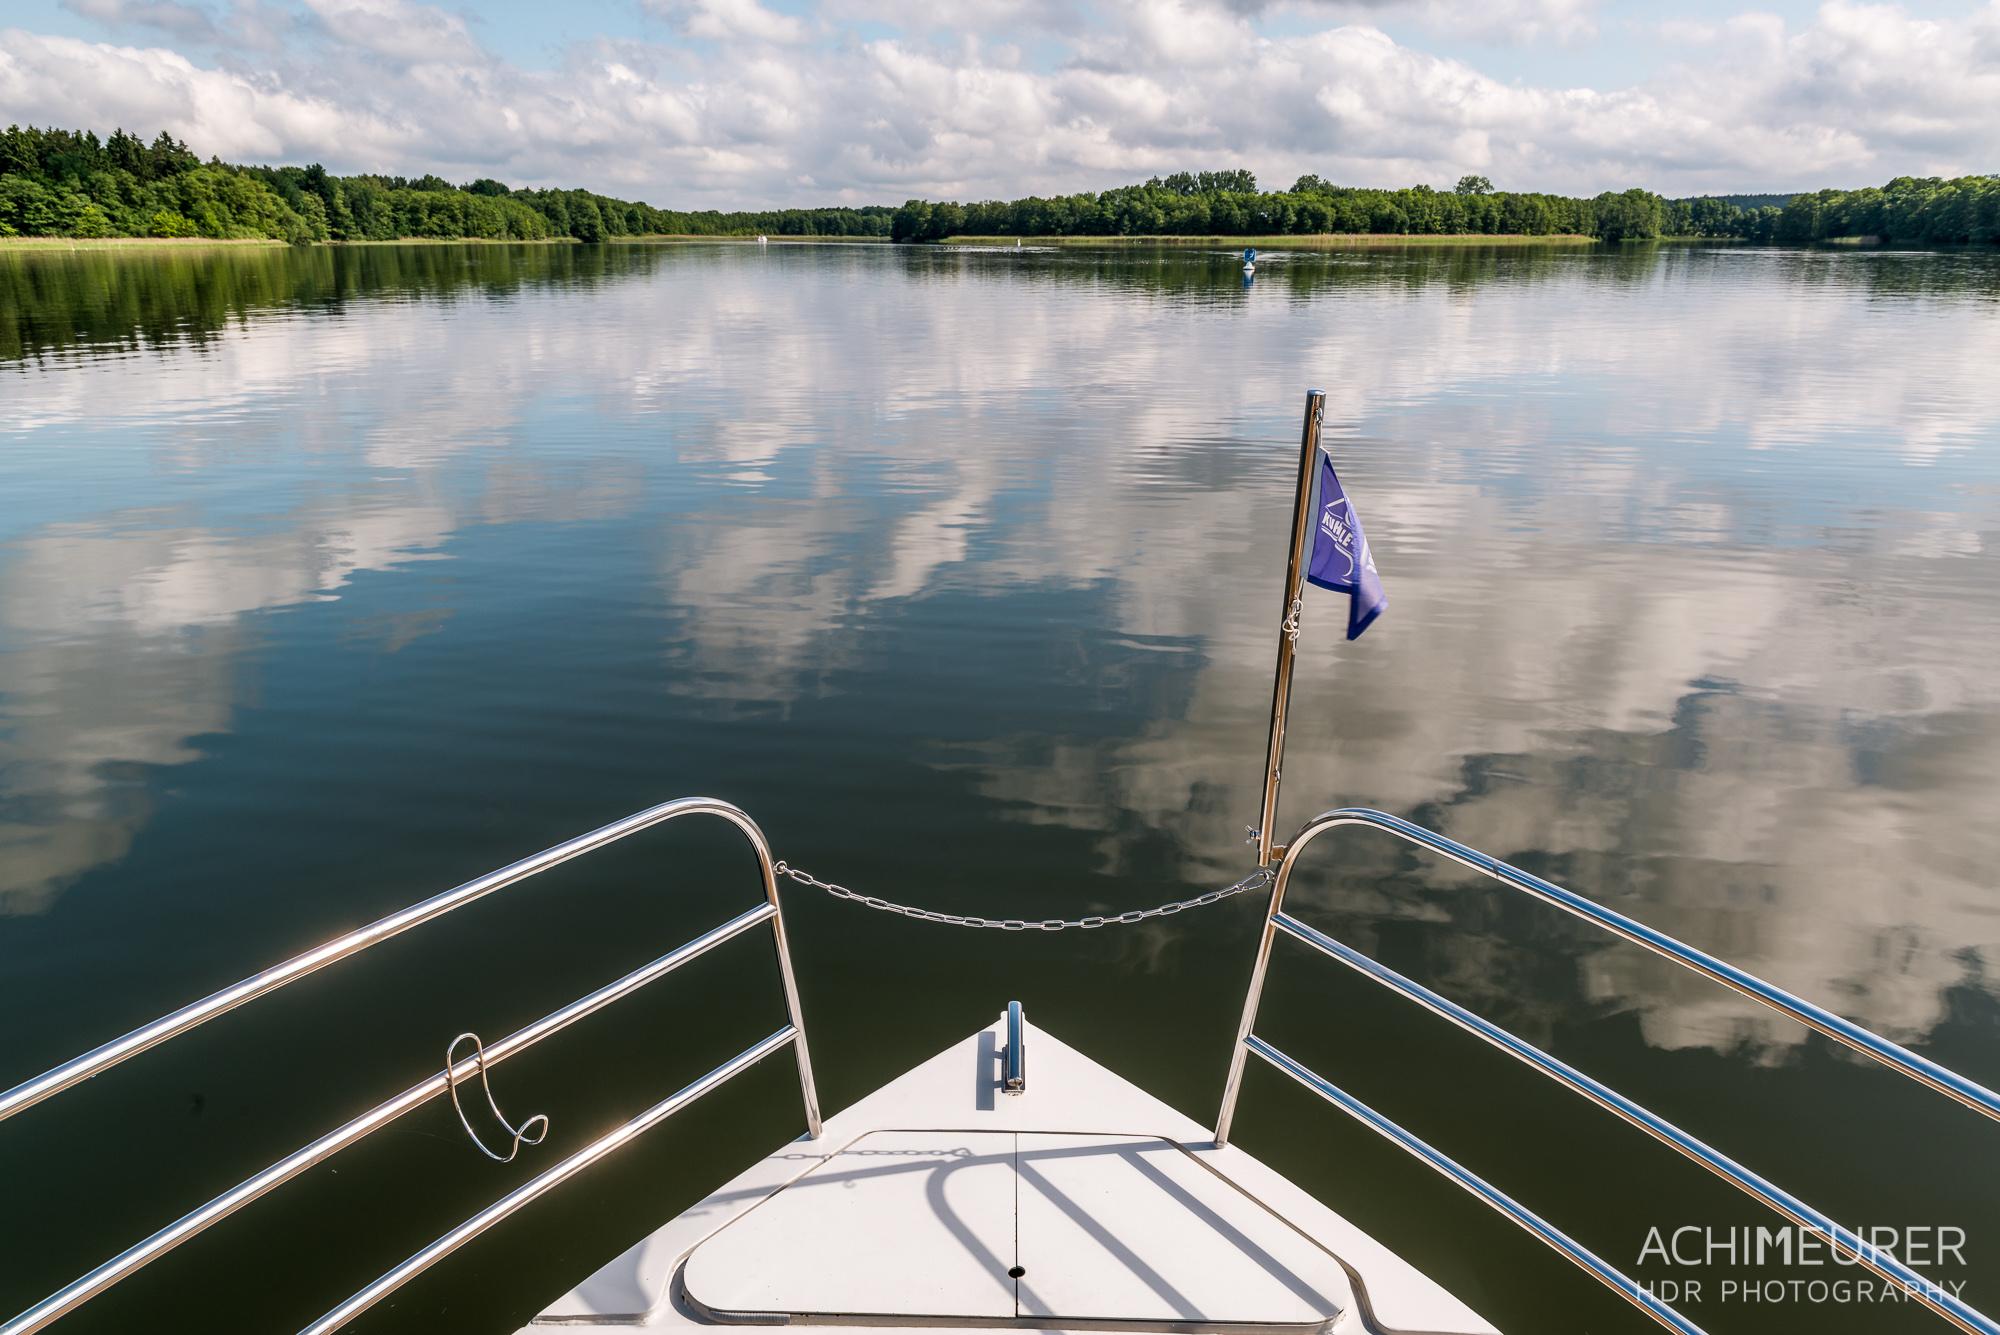 Hausboot-Kuhnle-Mueritz-Mecklenburg-Vorpommern-See_2820